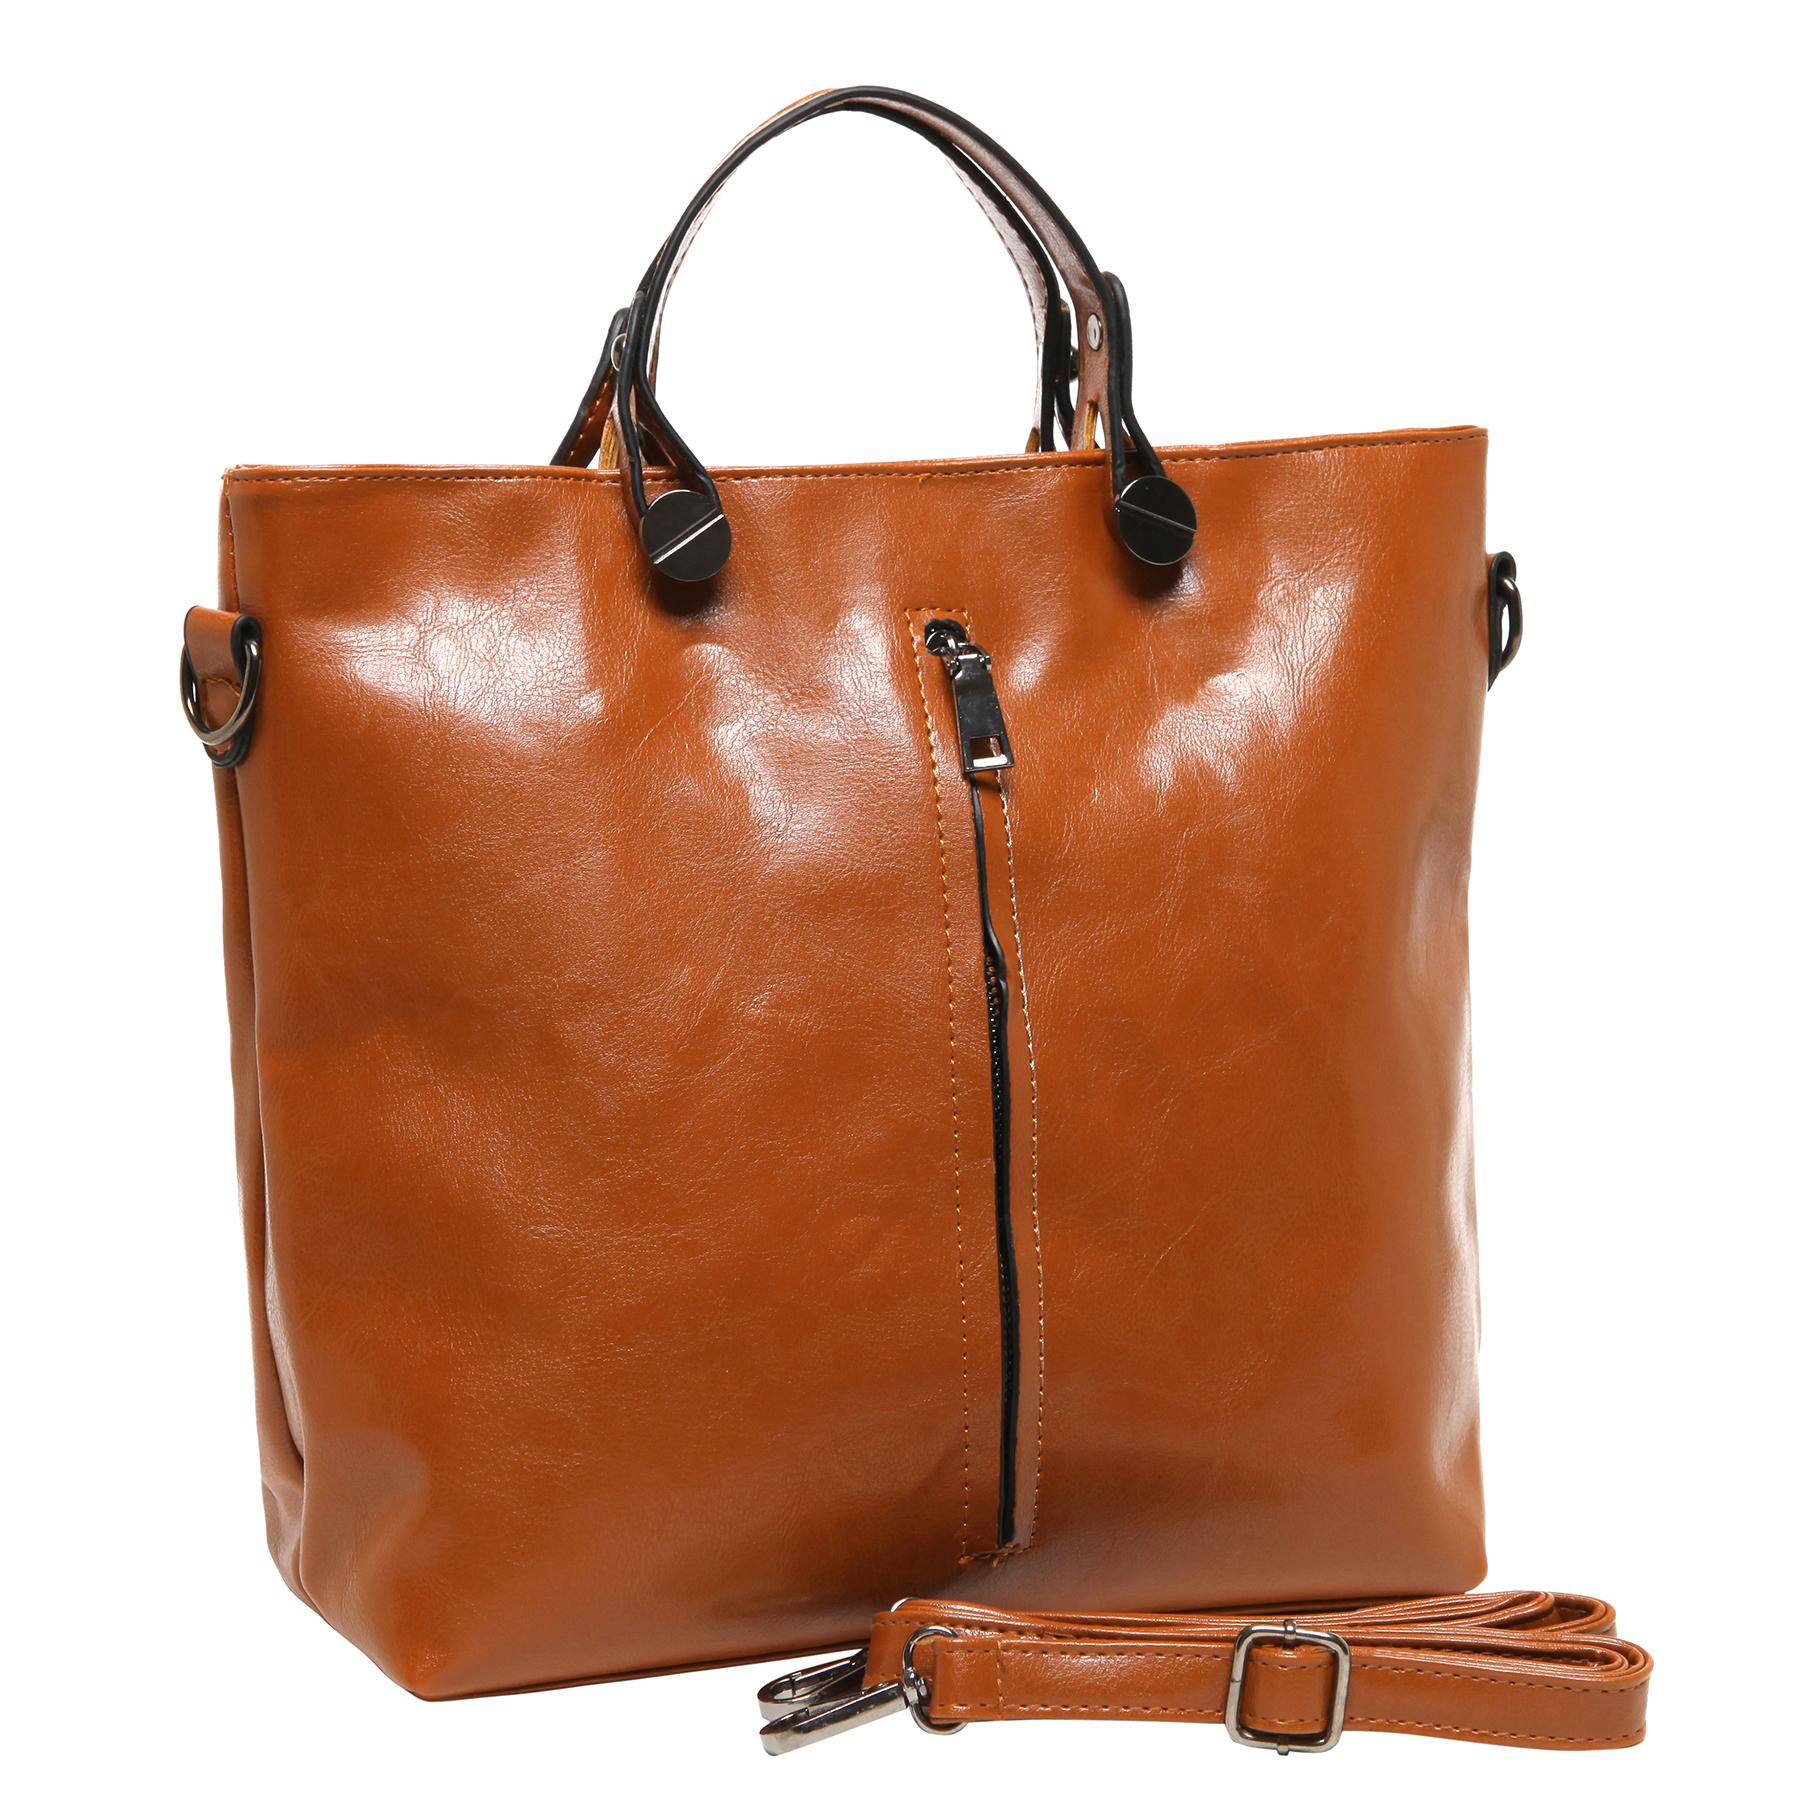 ALDIS Brown Top Handle Office Tote Handbag main